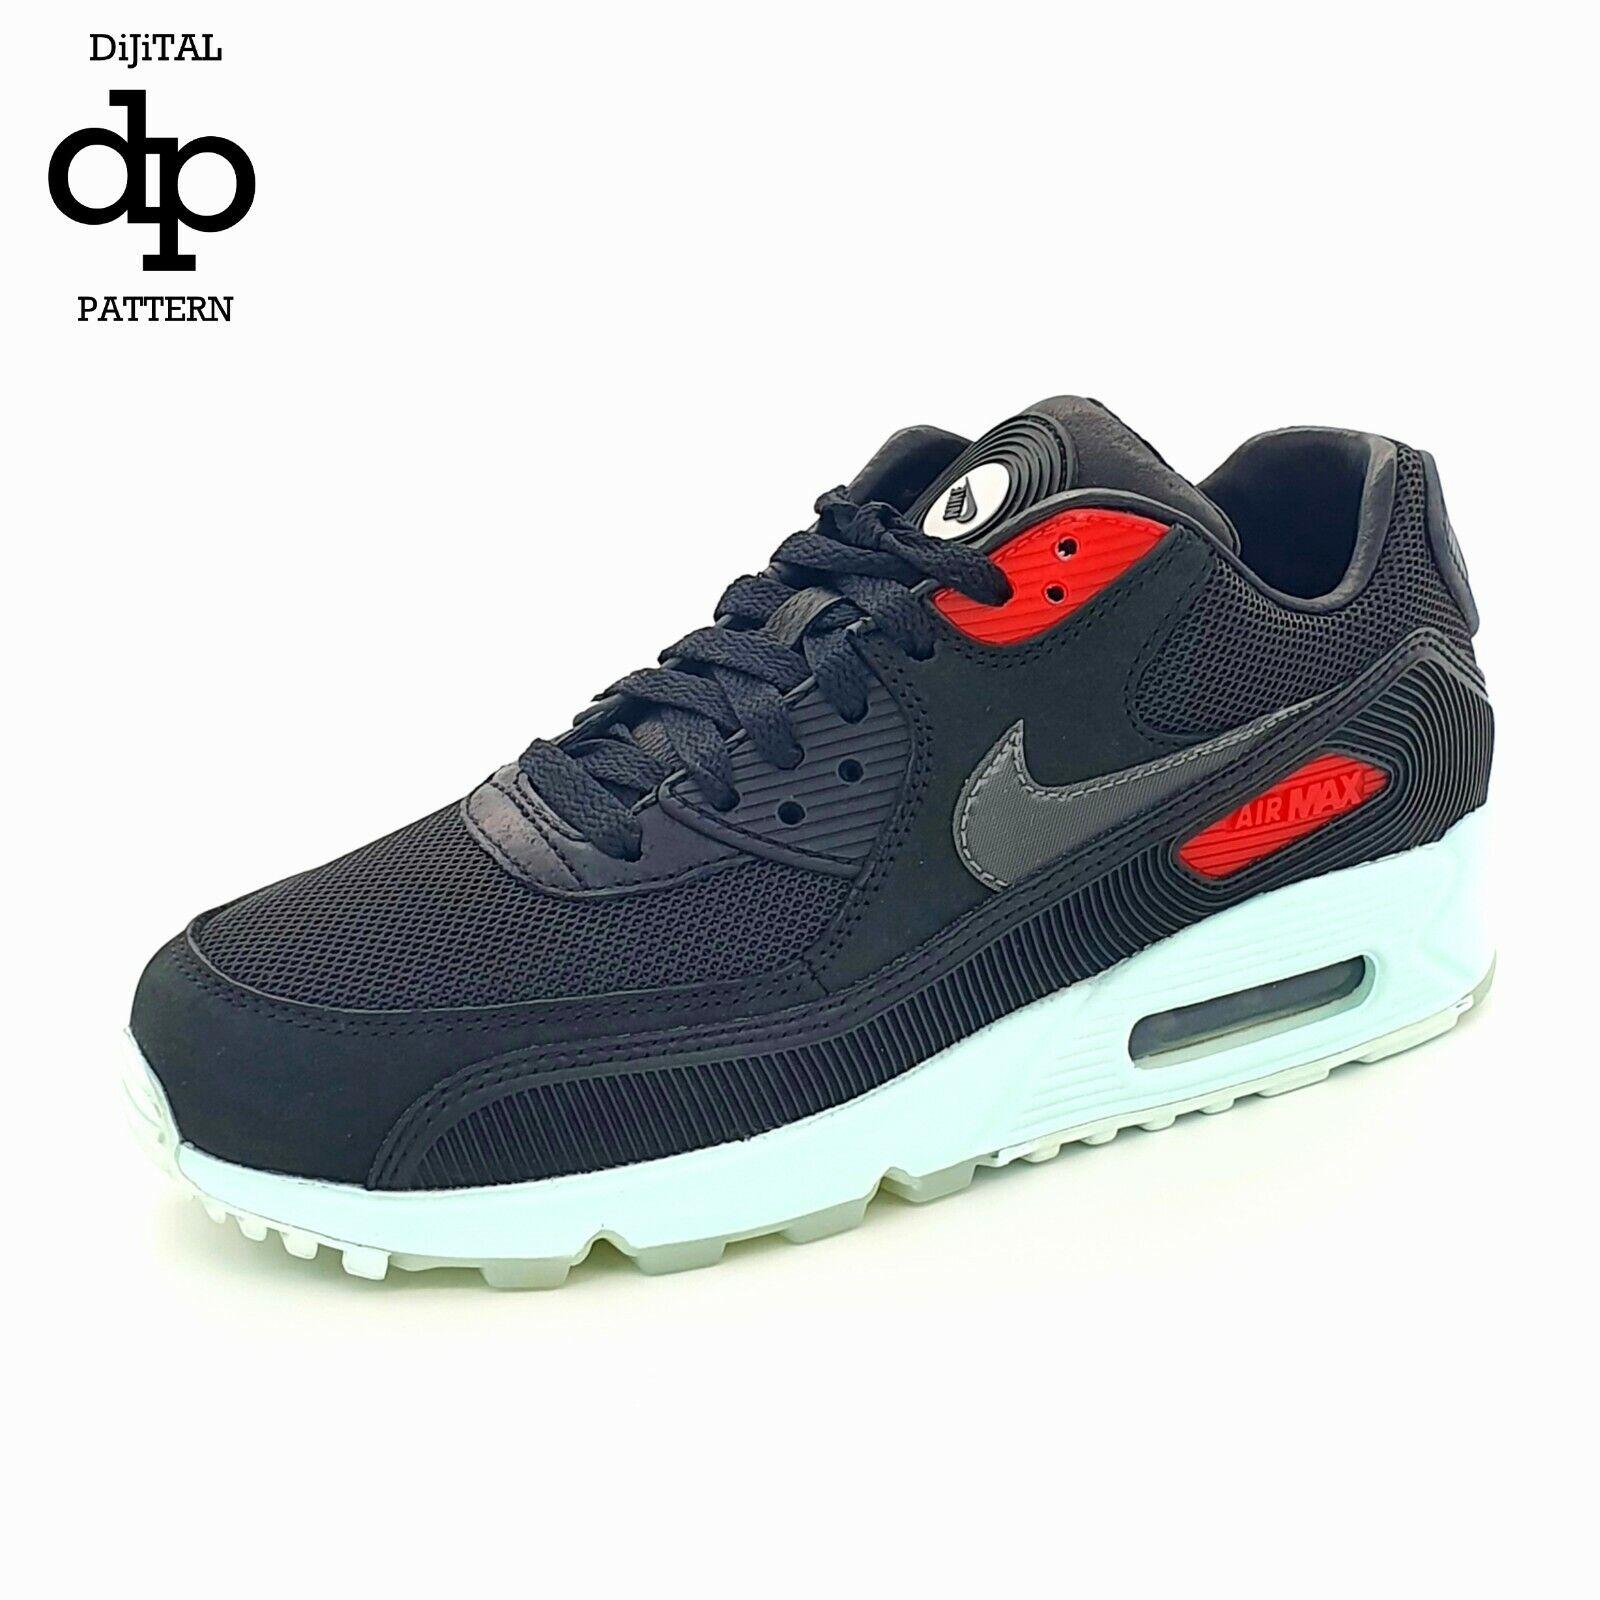 Nike Air Max 90 Premium/Vinyle/Cool Turquoise CK0902-001 ~ UK 5/US 6/EU 38